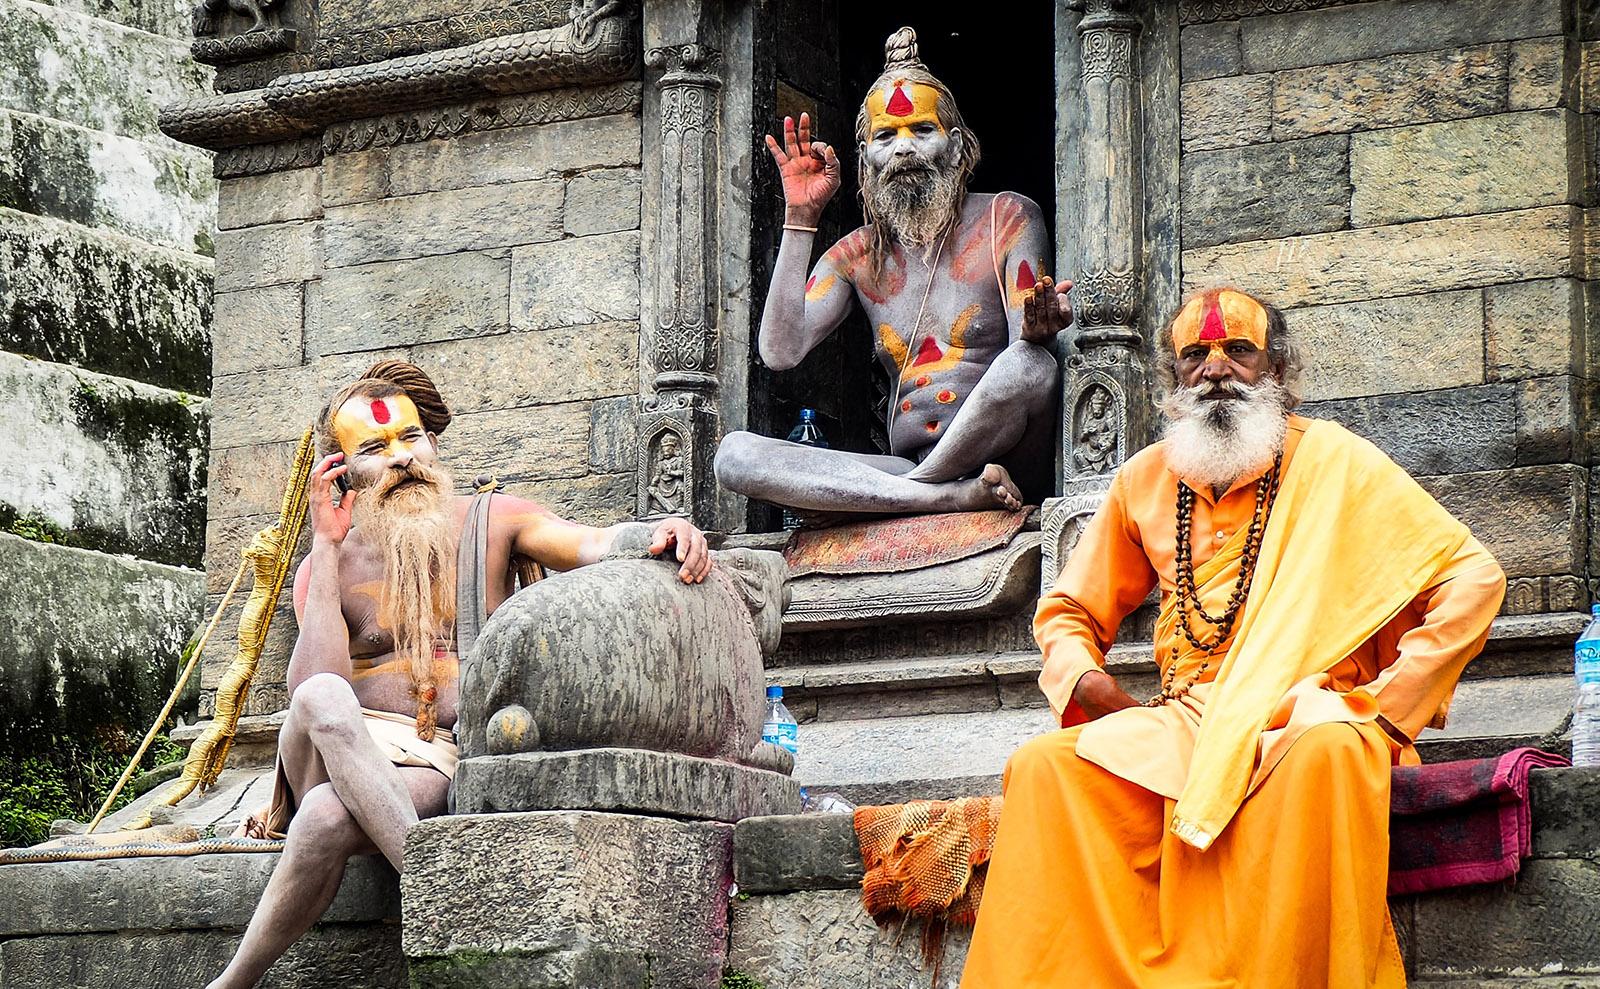 Hindu Holymen, Dark Academia, Storytelling Fests, Secret Language & More: Endnotes 16 October